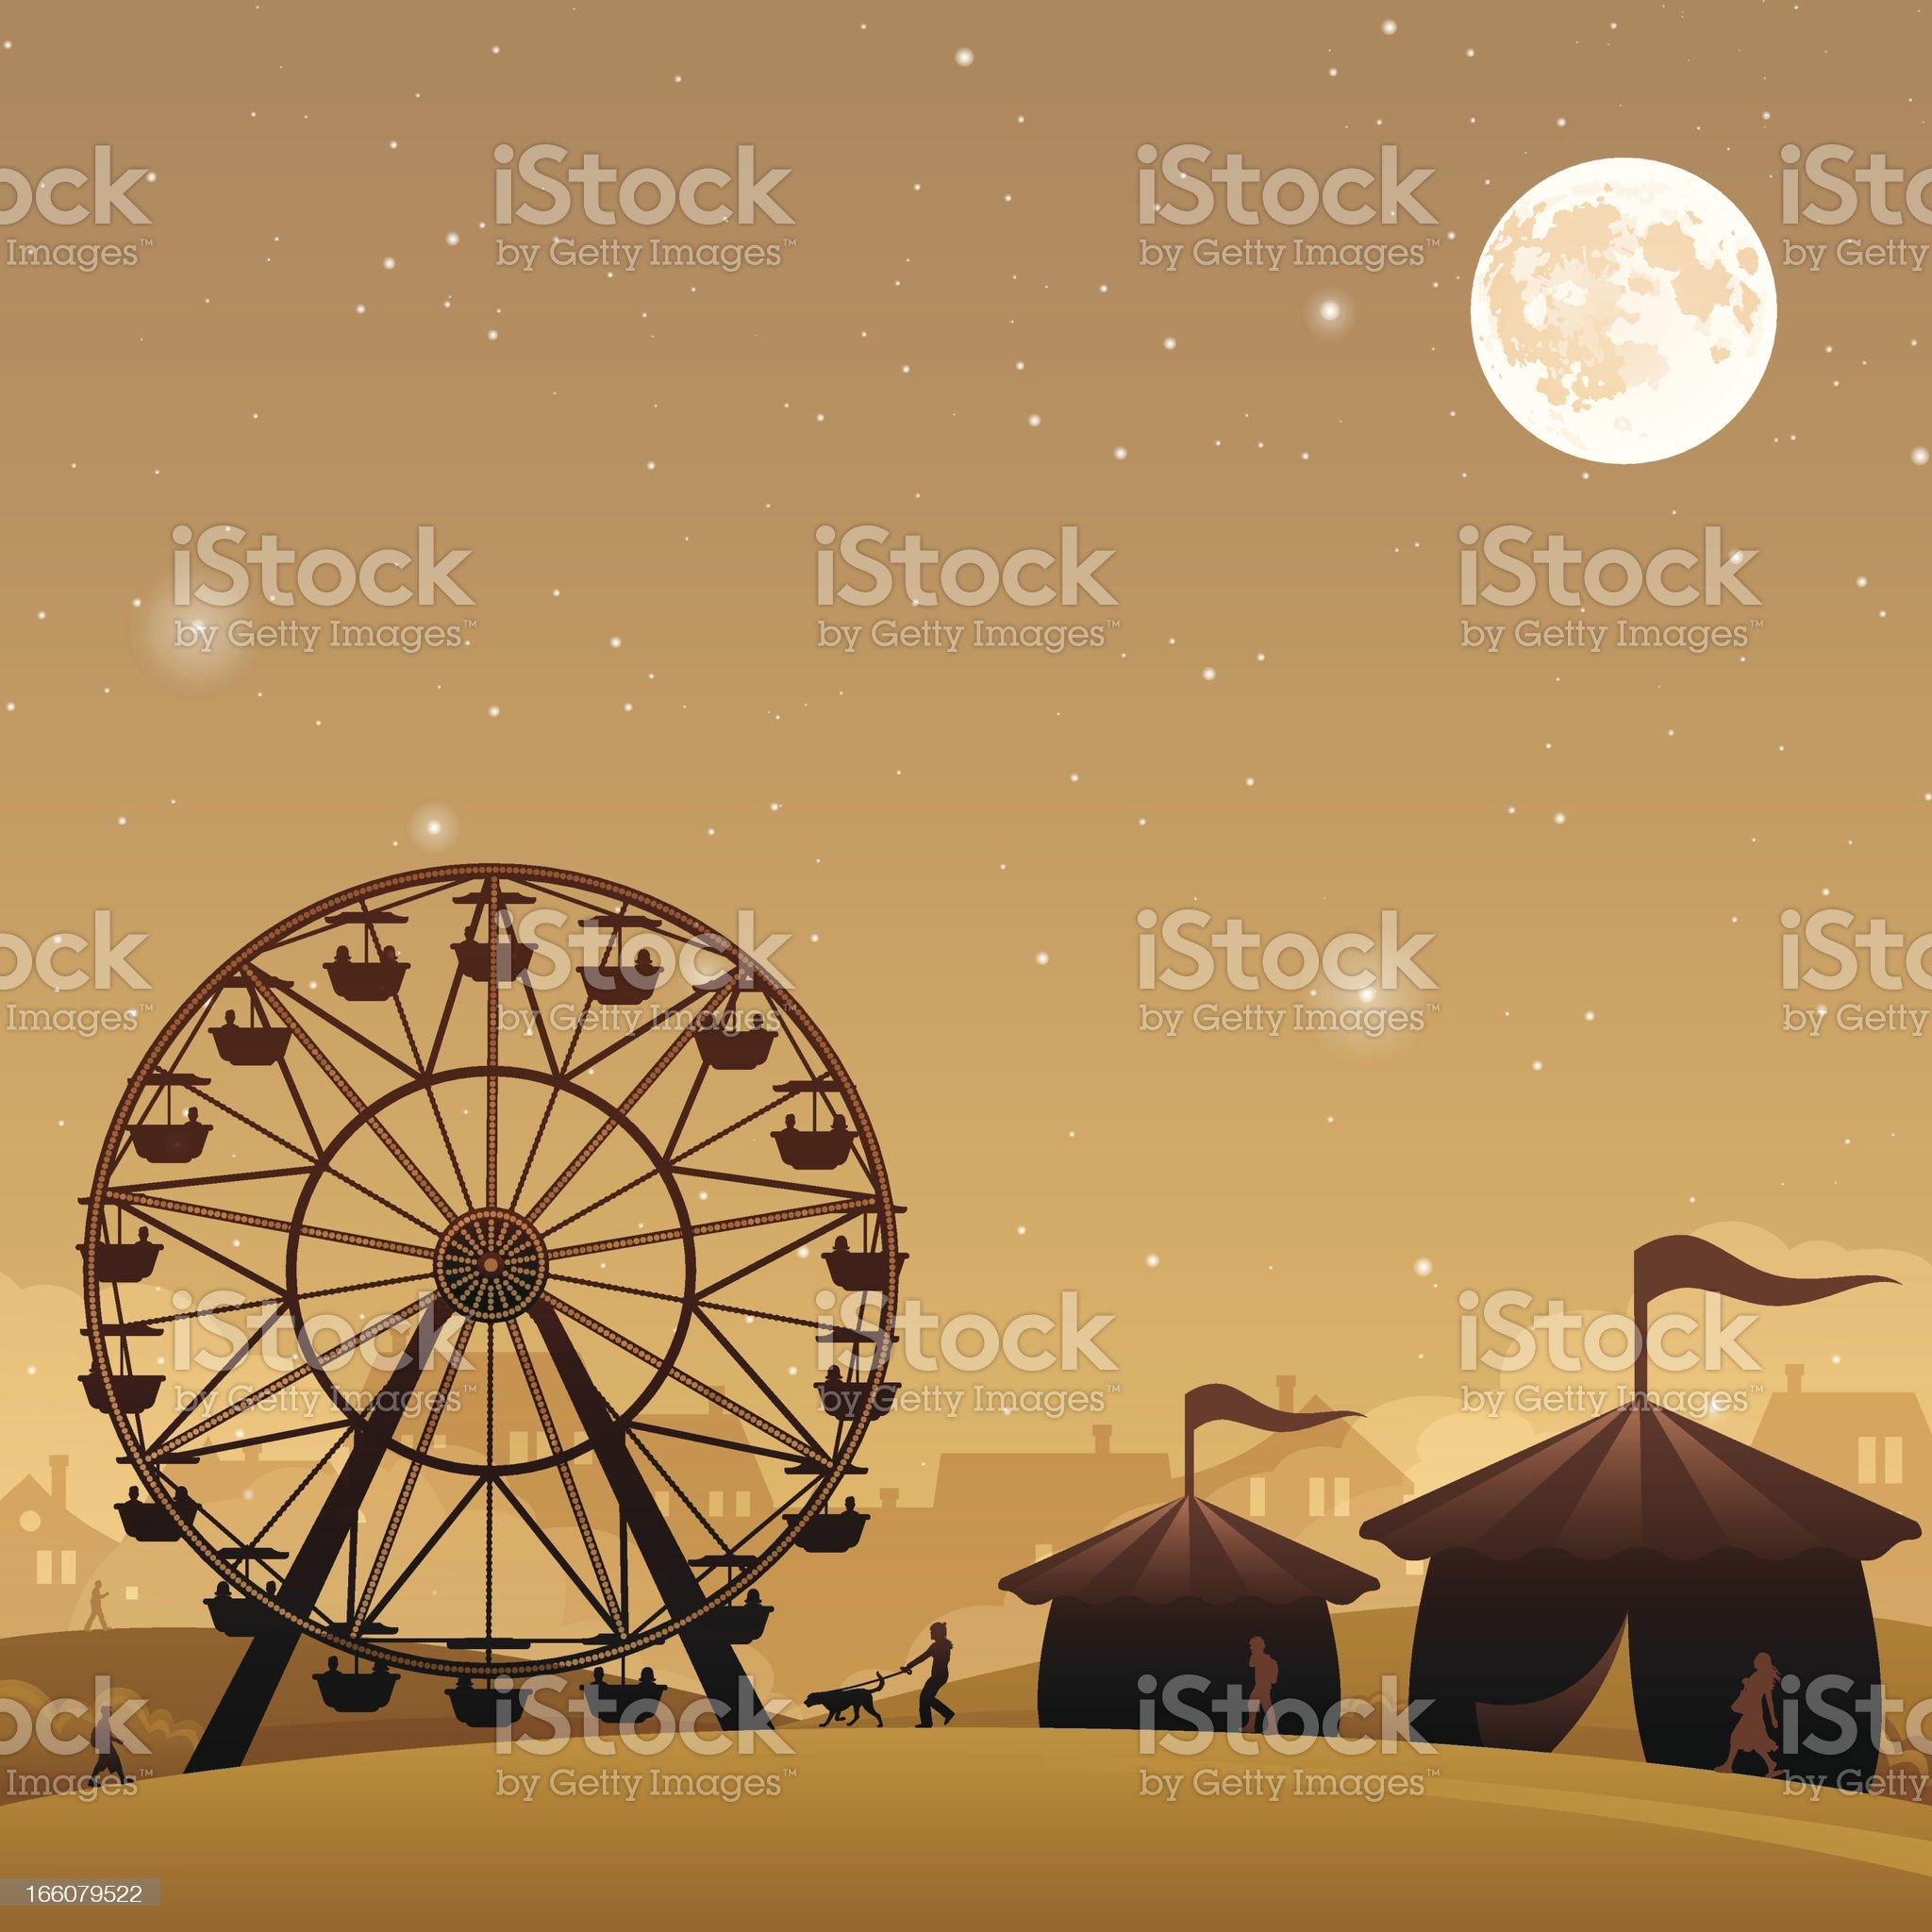 Festival royalty-free stock vector art